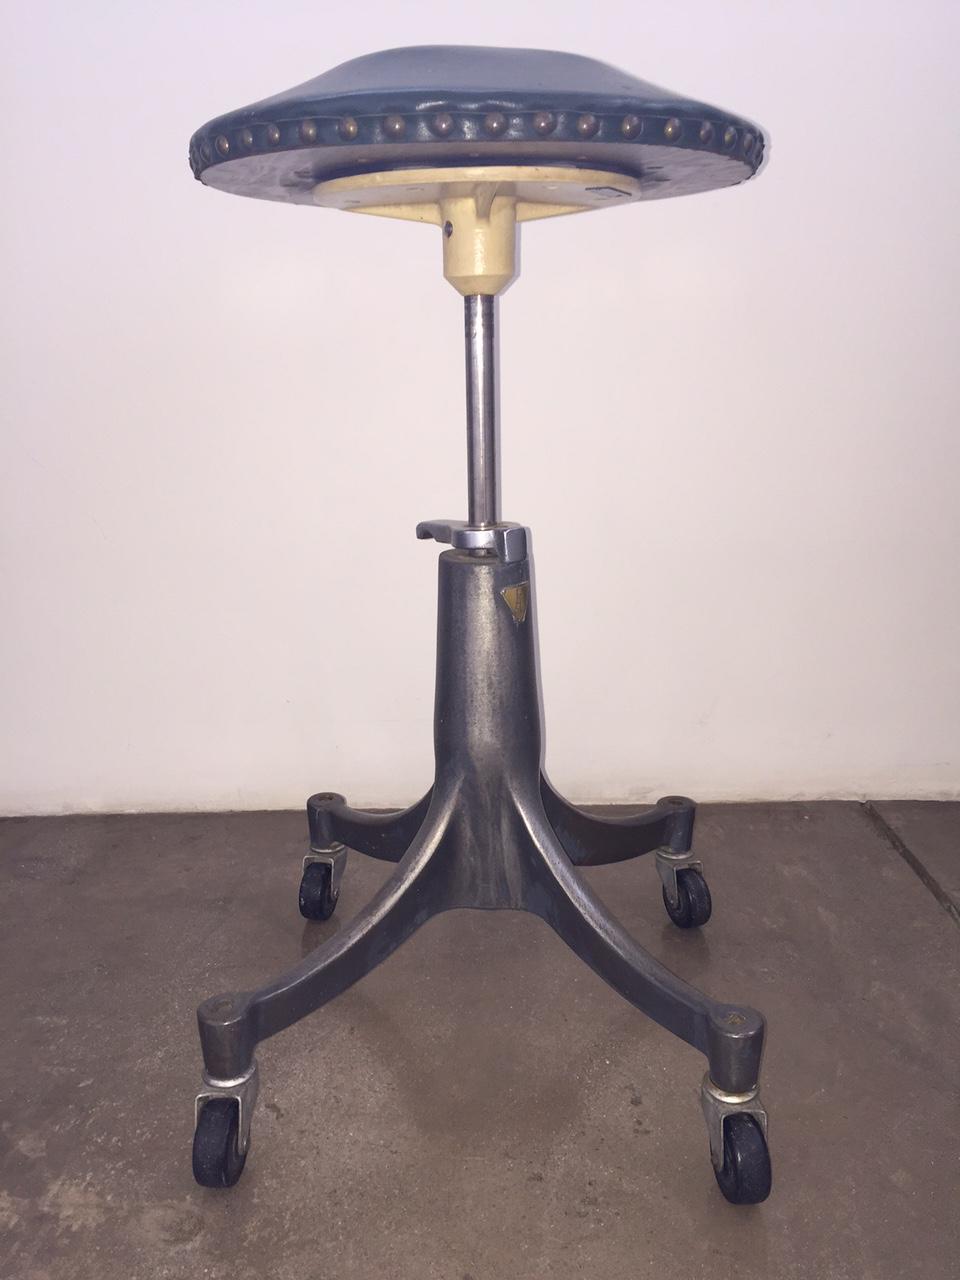 Vintage Industrial Bausch U0026 Lomb Adjustable Stool   Image 2 ...